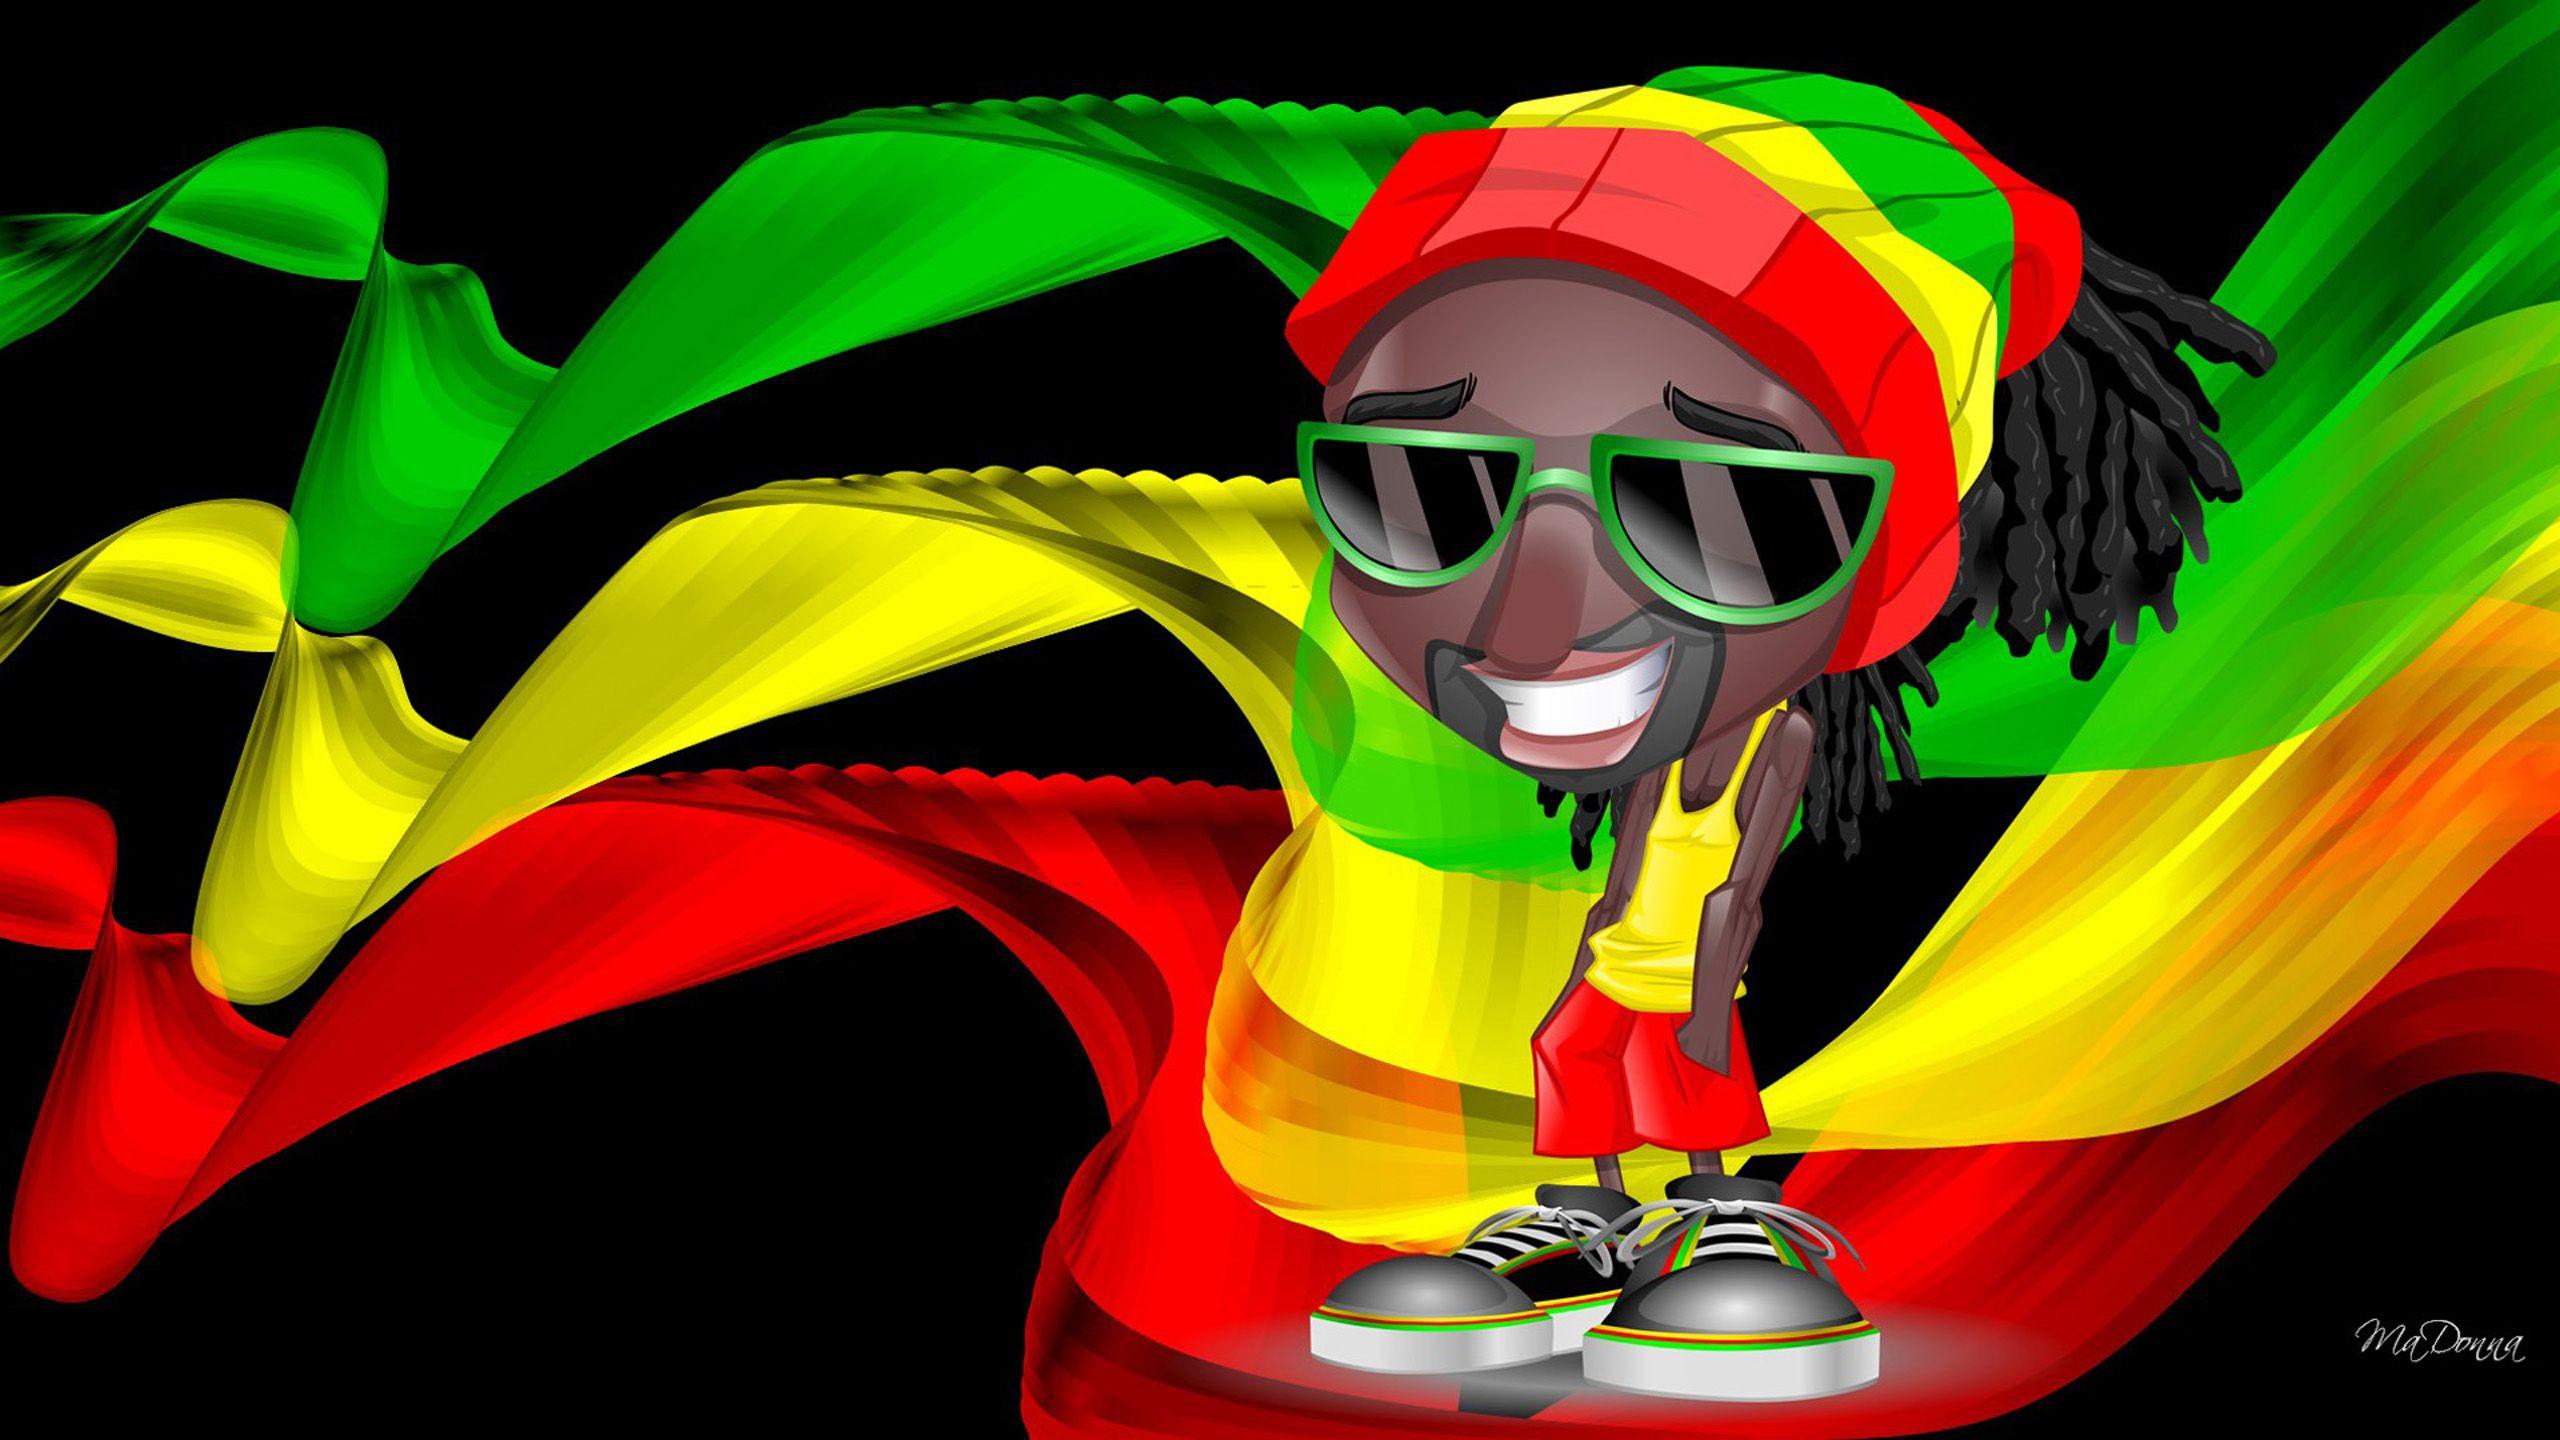 Rasta color girl wallpaper hd desktop wallpapers anny em 2019 coringa - Reggae girl wallpaper ...